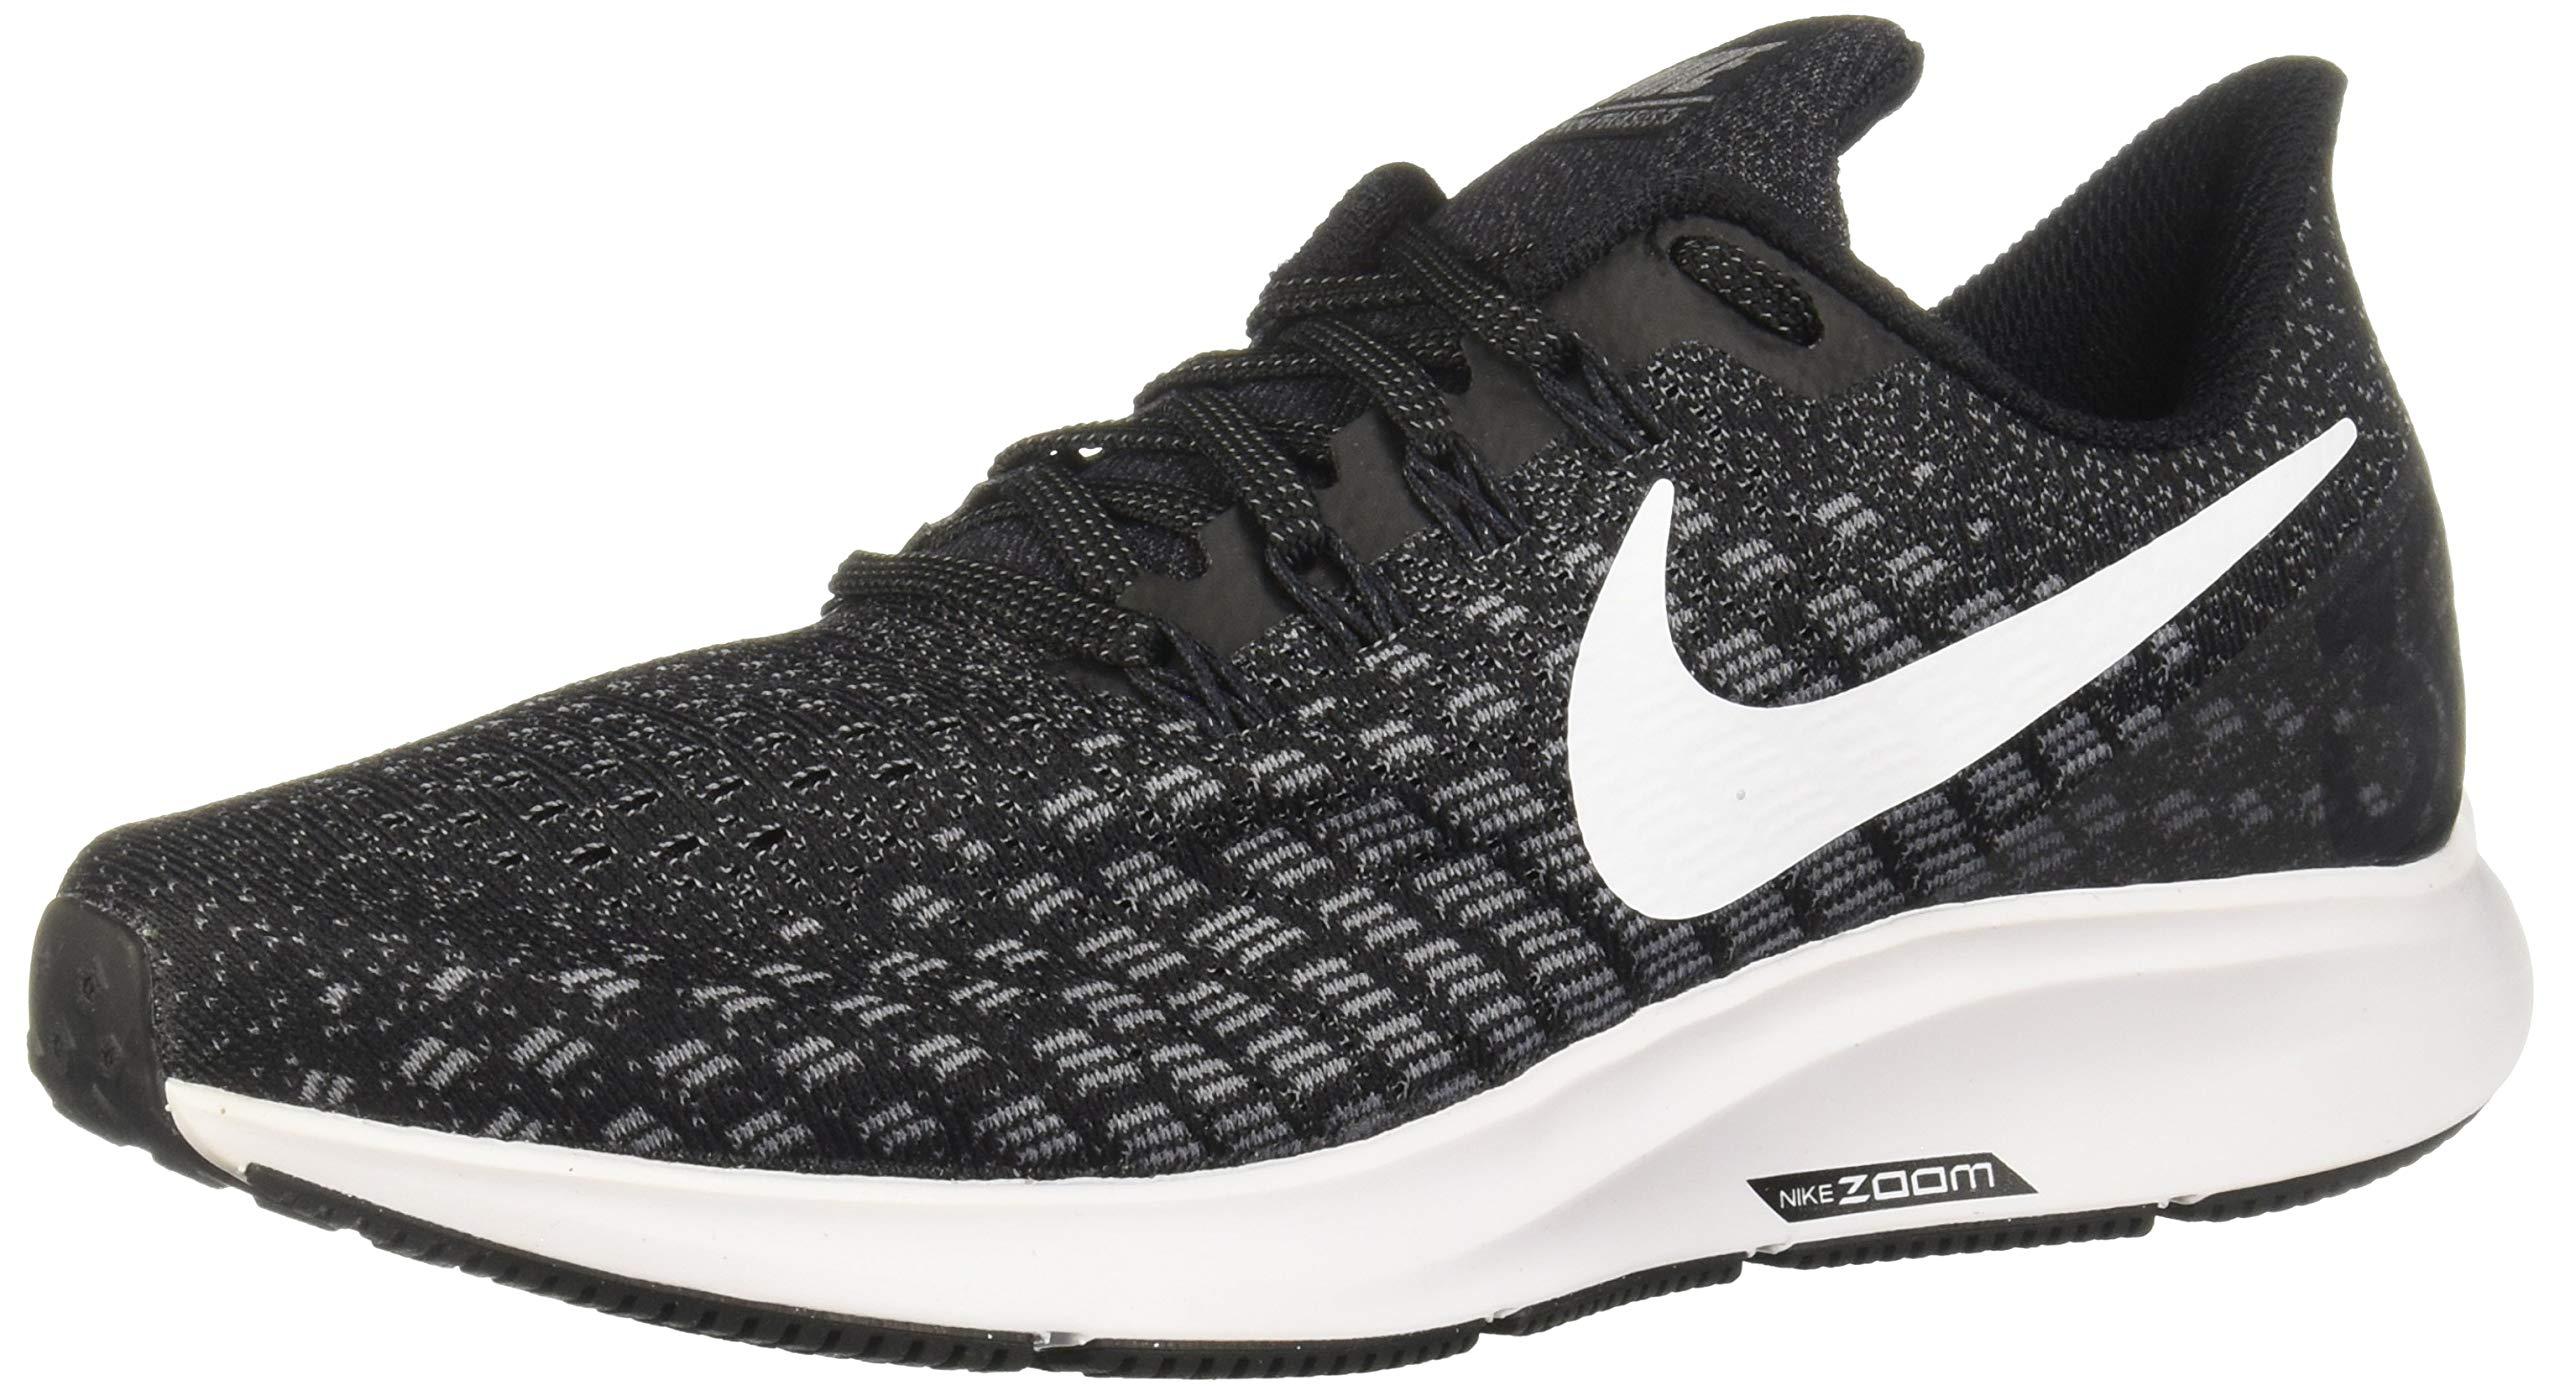 Nike Shox Current Gs Women's Running Shoe (5, Black/Black) by Nike (Image #1)